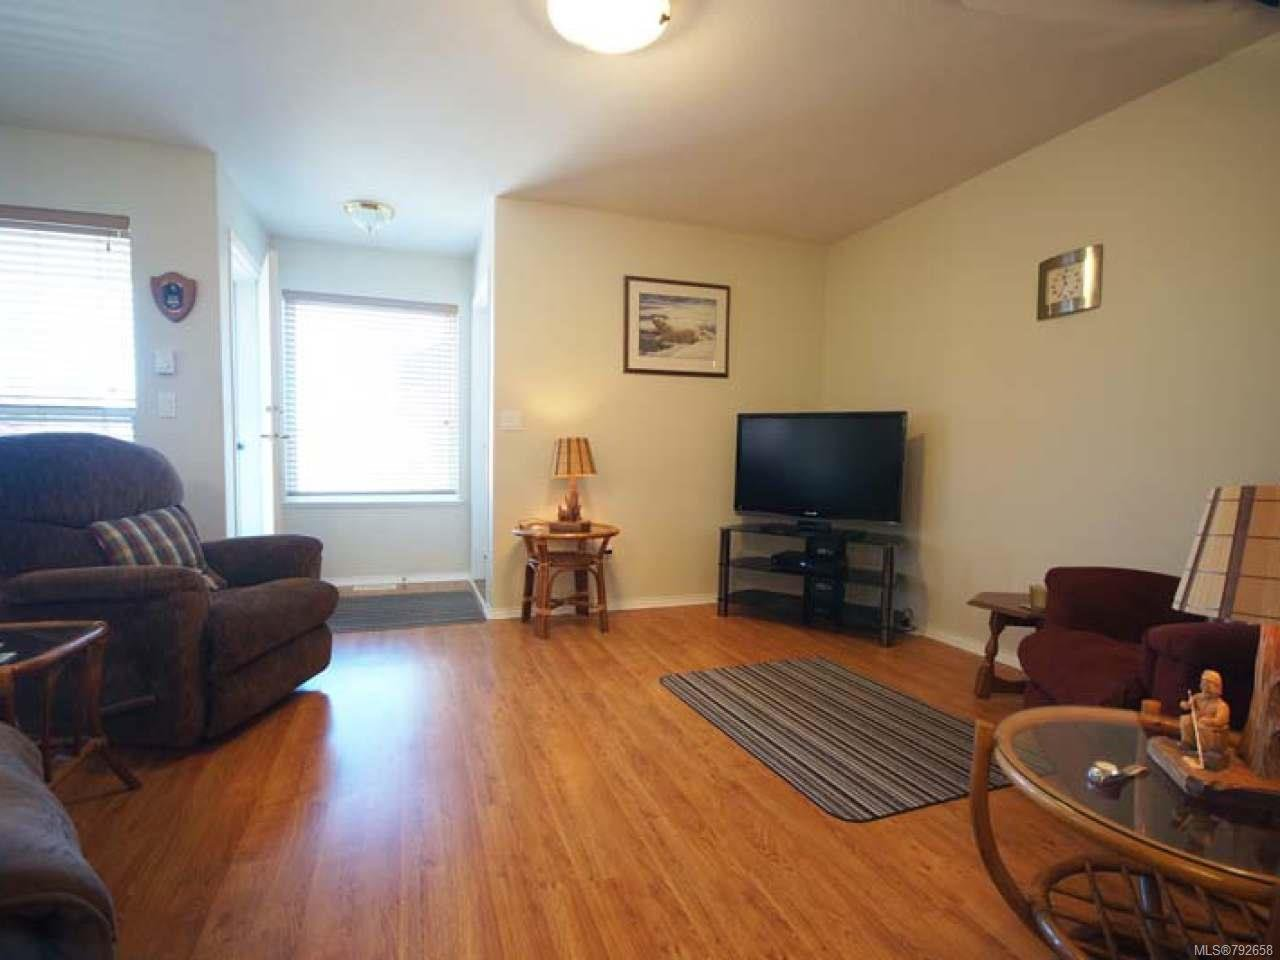 Photo 5: Photos: 893 EDGEWARE Avenue in PARKSVILLE: PQ Parksville House for sale (Parksville/Qualicum)  : MLS®# 792658